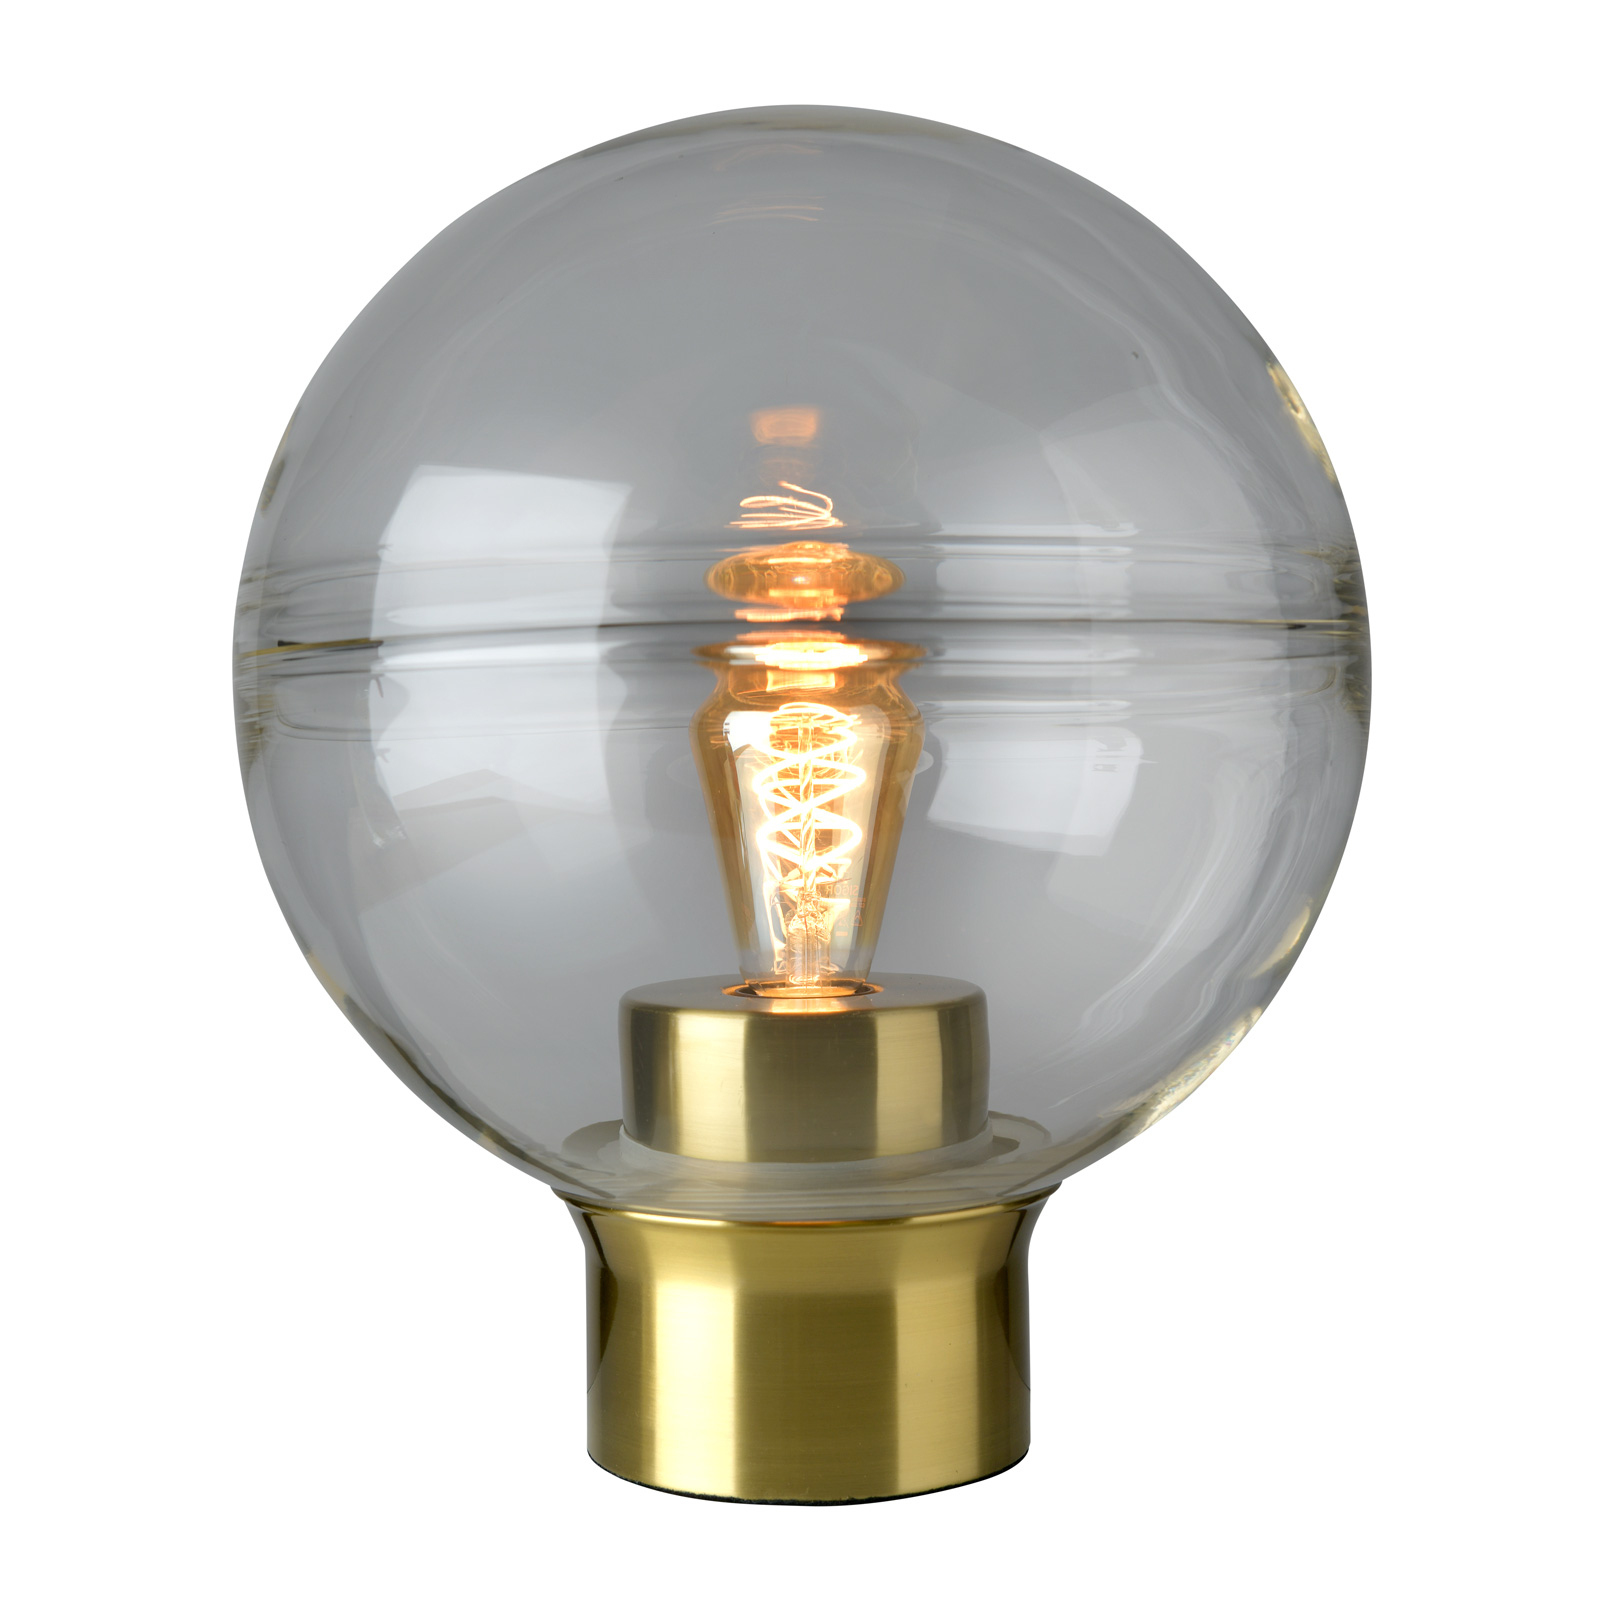 Villeroy & Boch Tokio tafellamp, goud Ø 30 cm